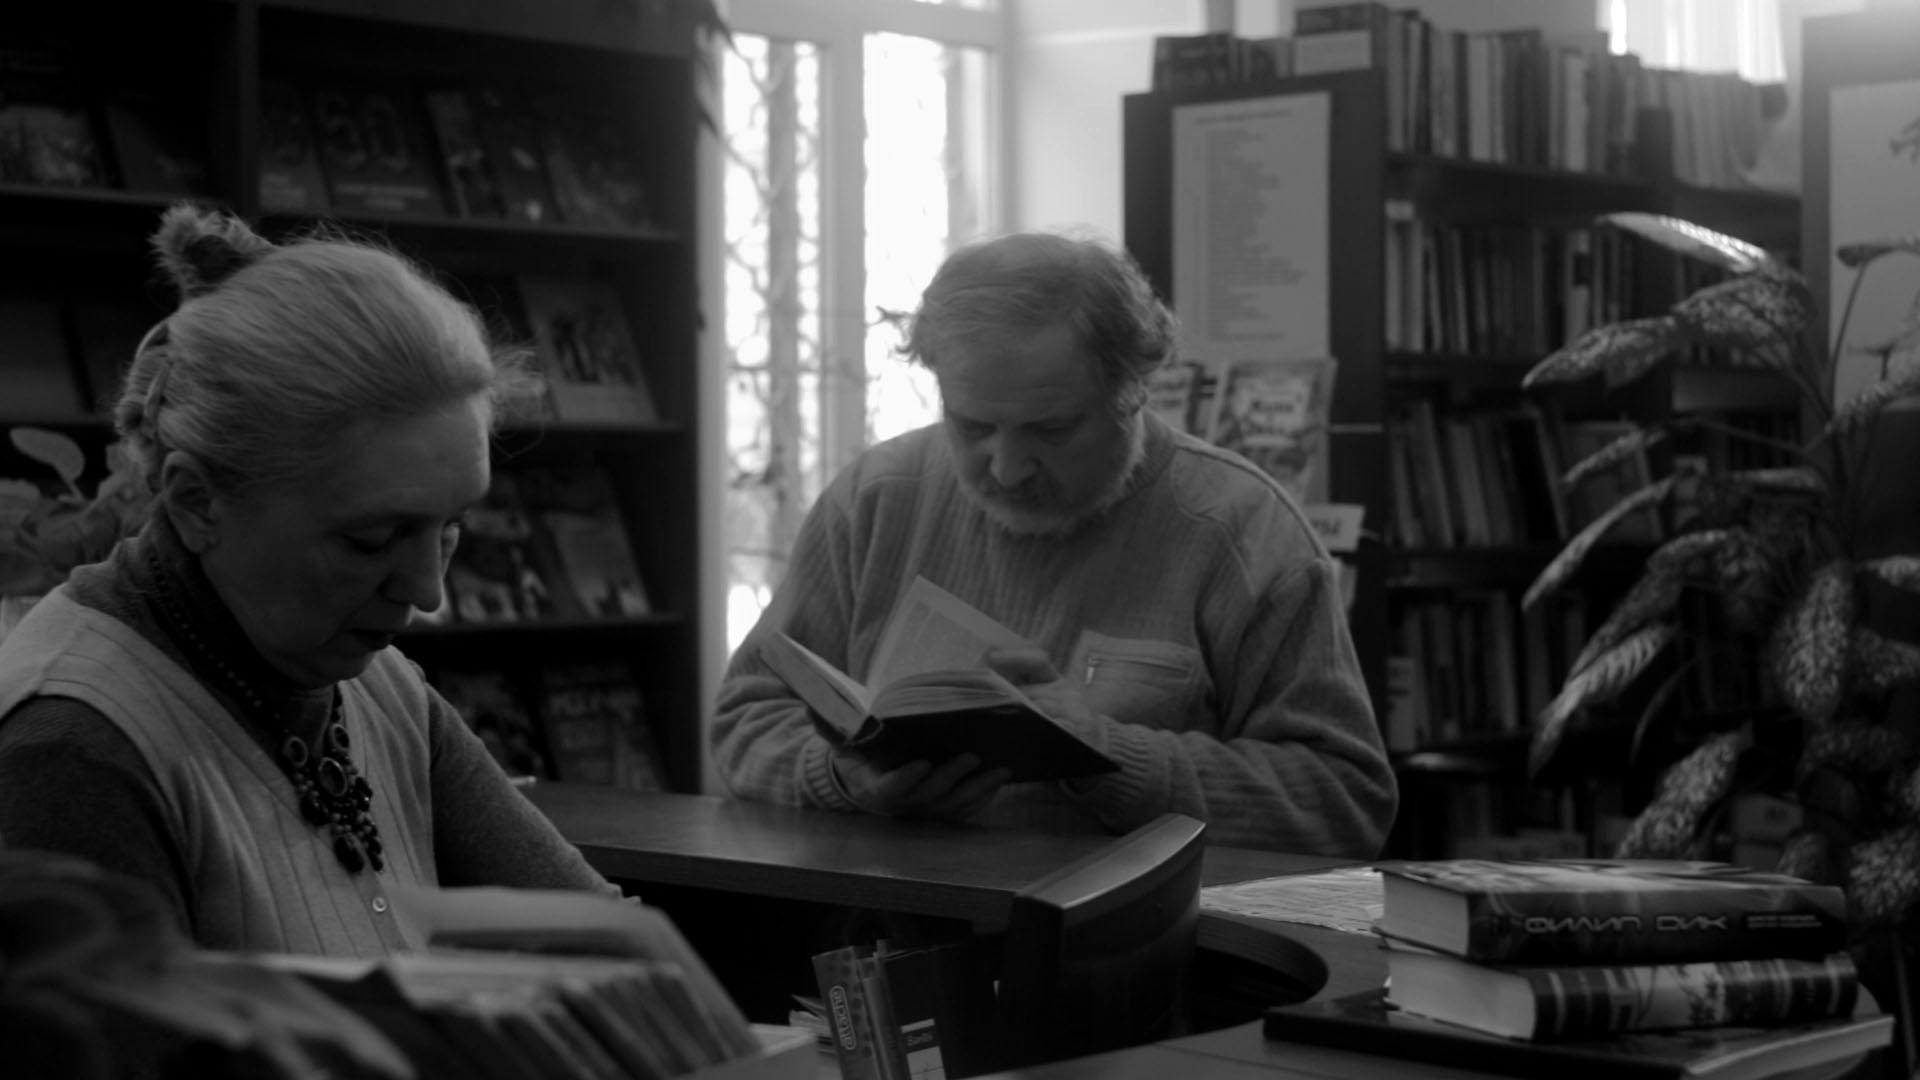 «Сын», реж. Арсений Гончуков, 2014 (камео Сергея Кудрявцева)